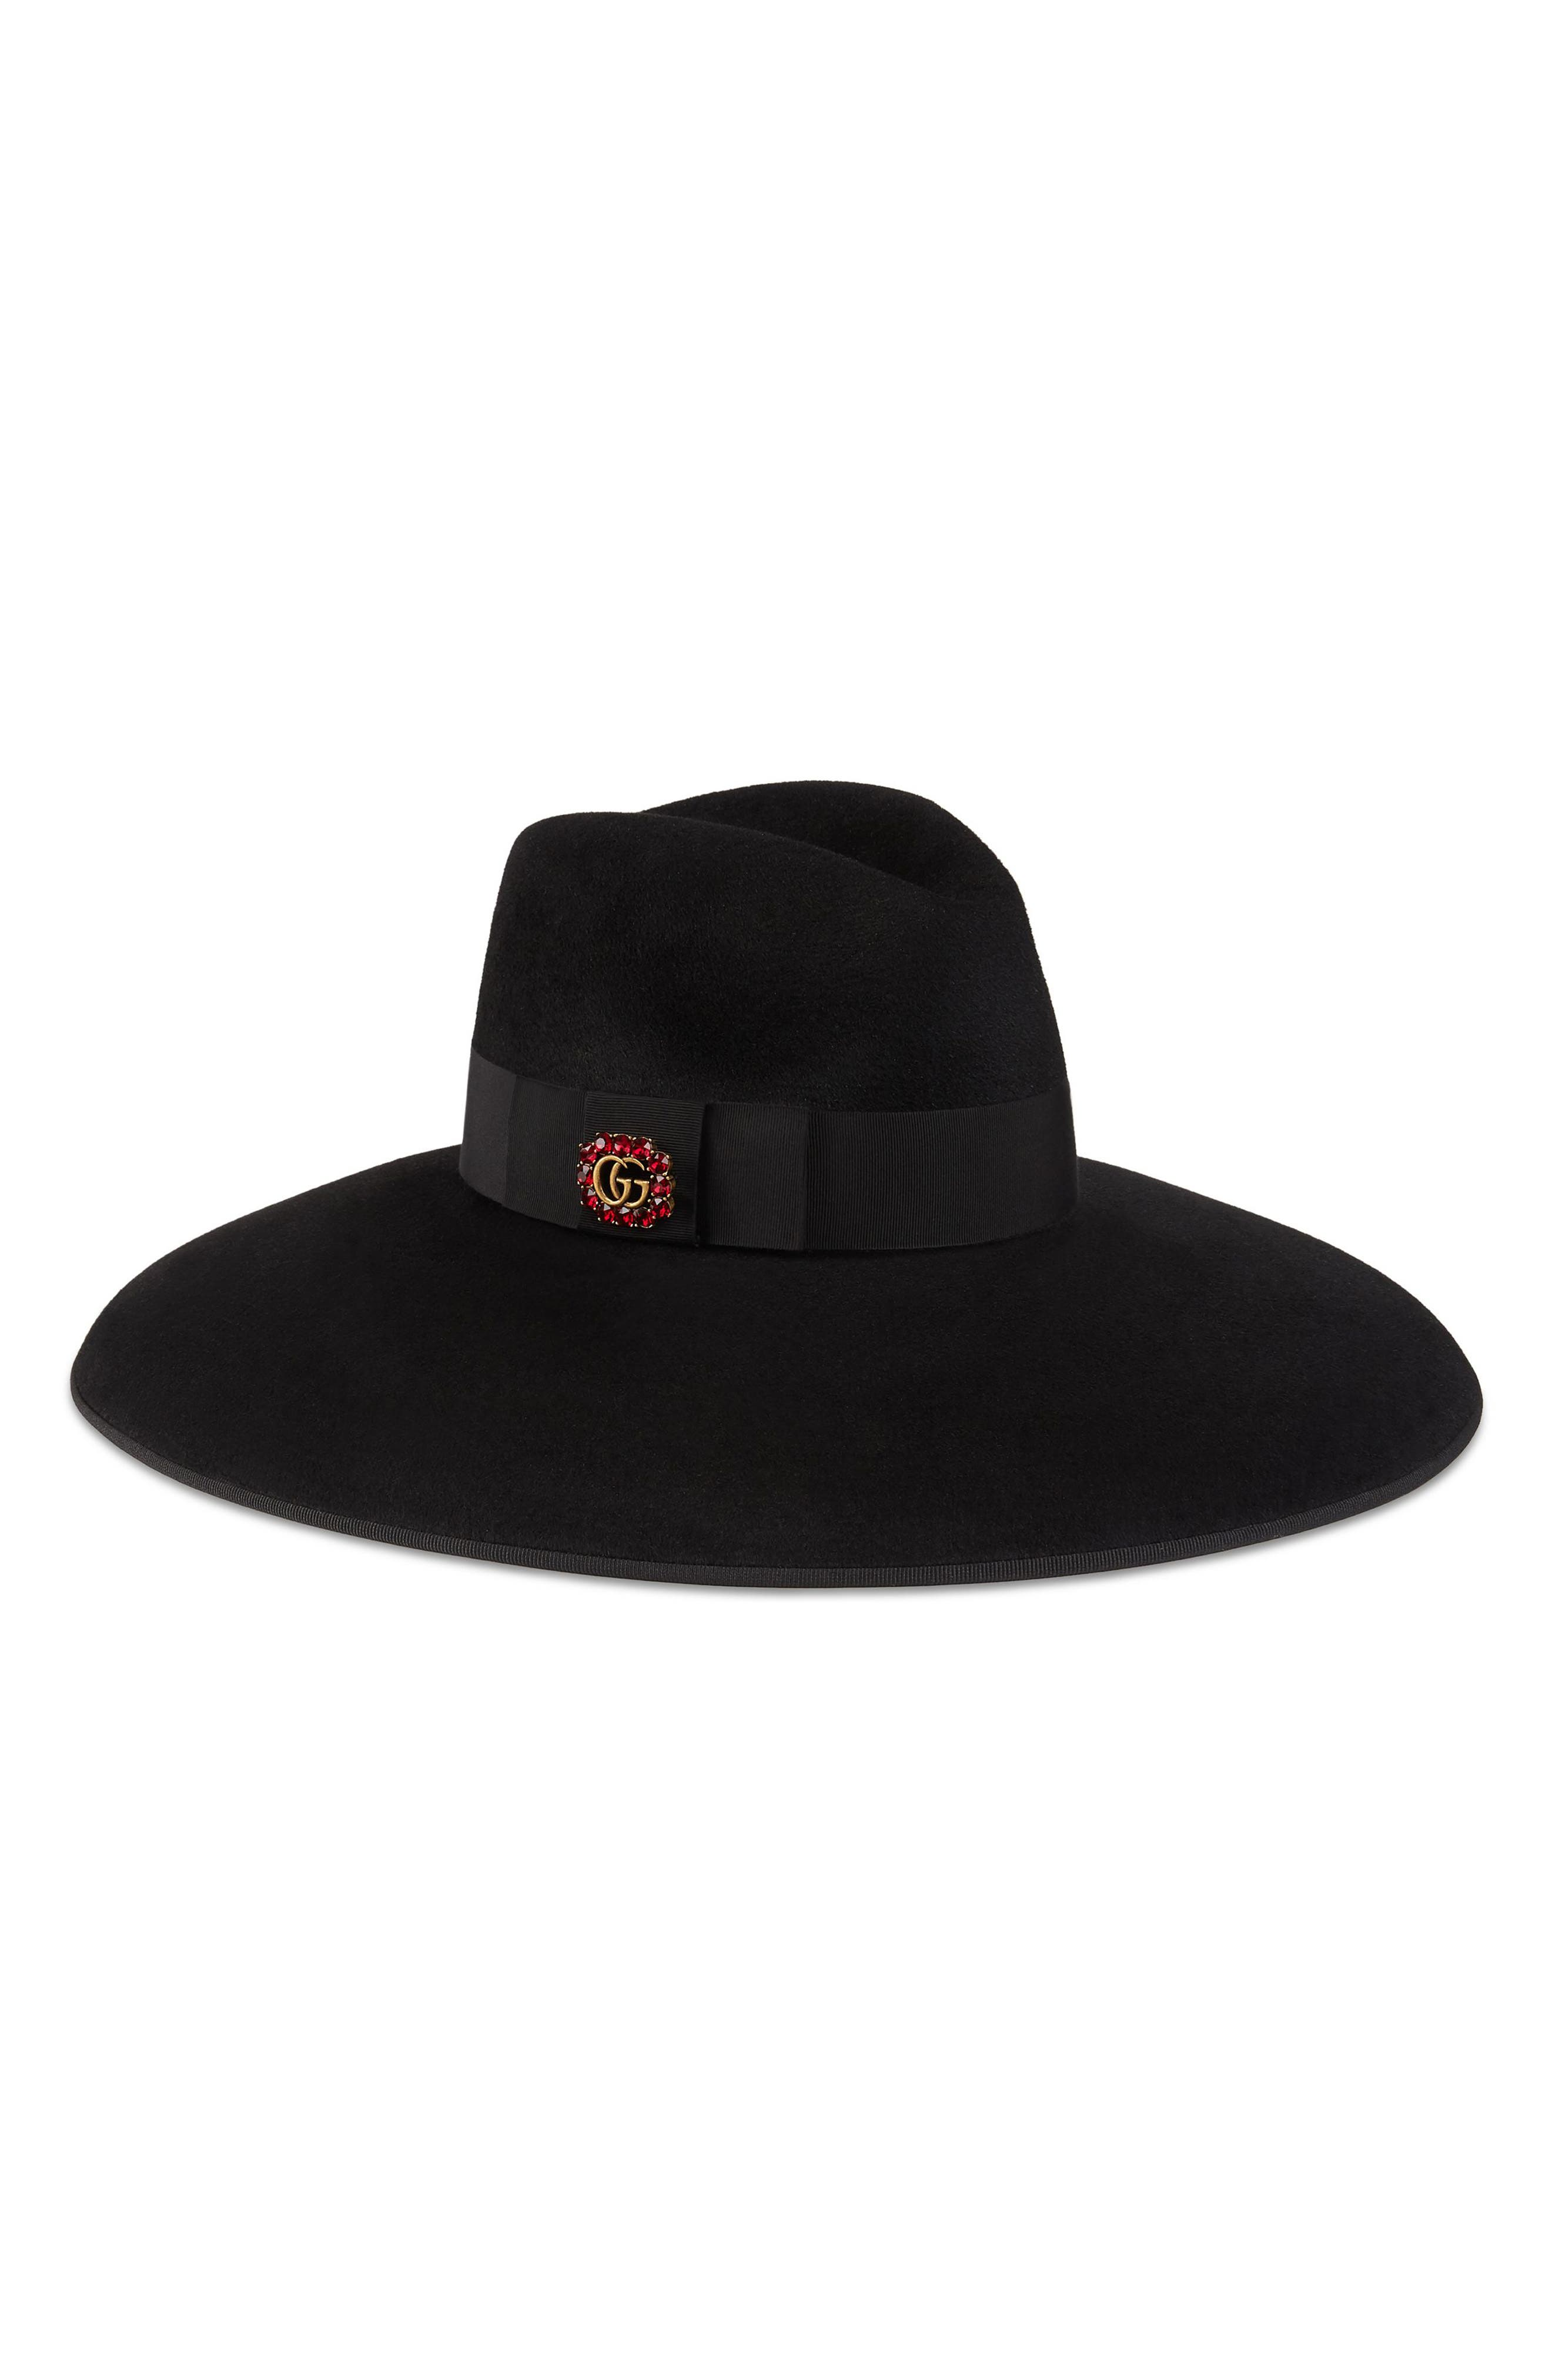 Fur Felt Wide Brim Hat,                         Main,                         color, Black/ Black